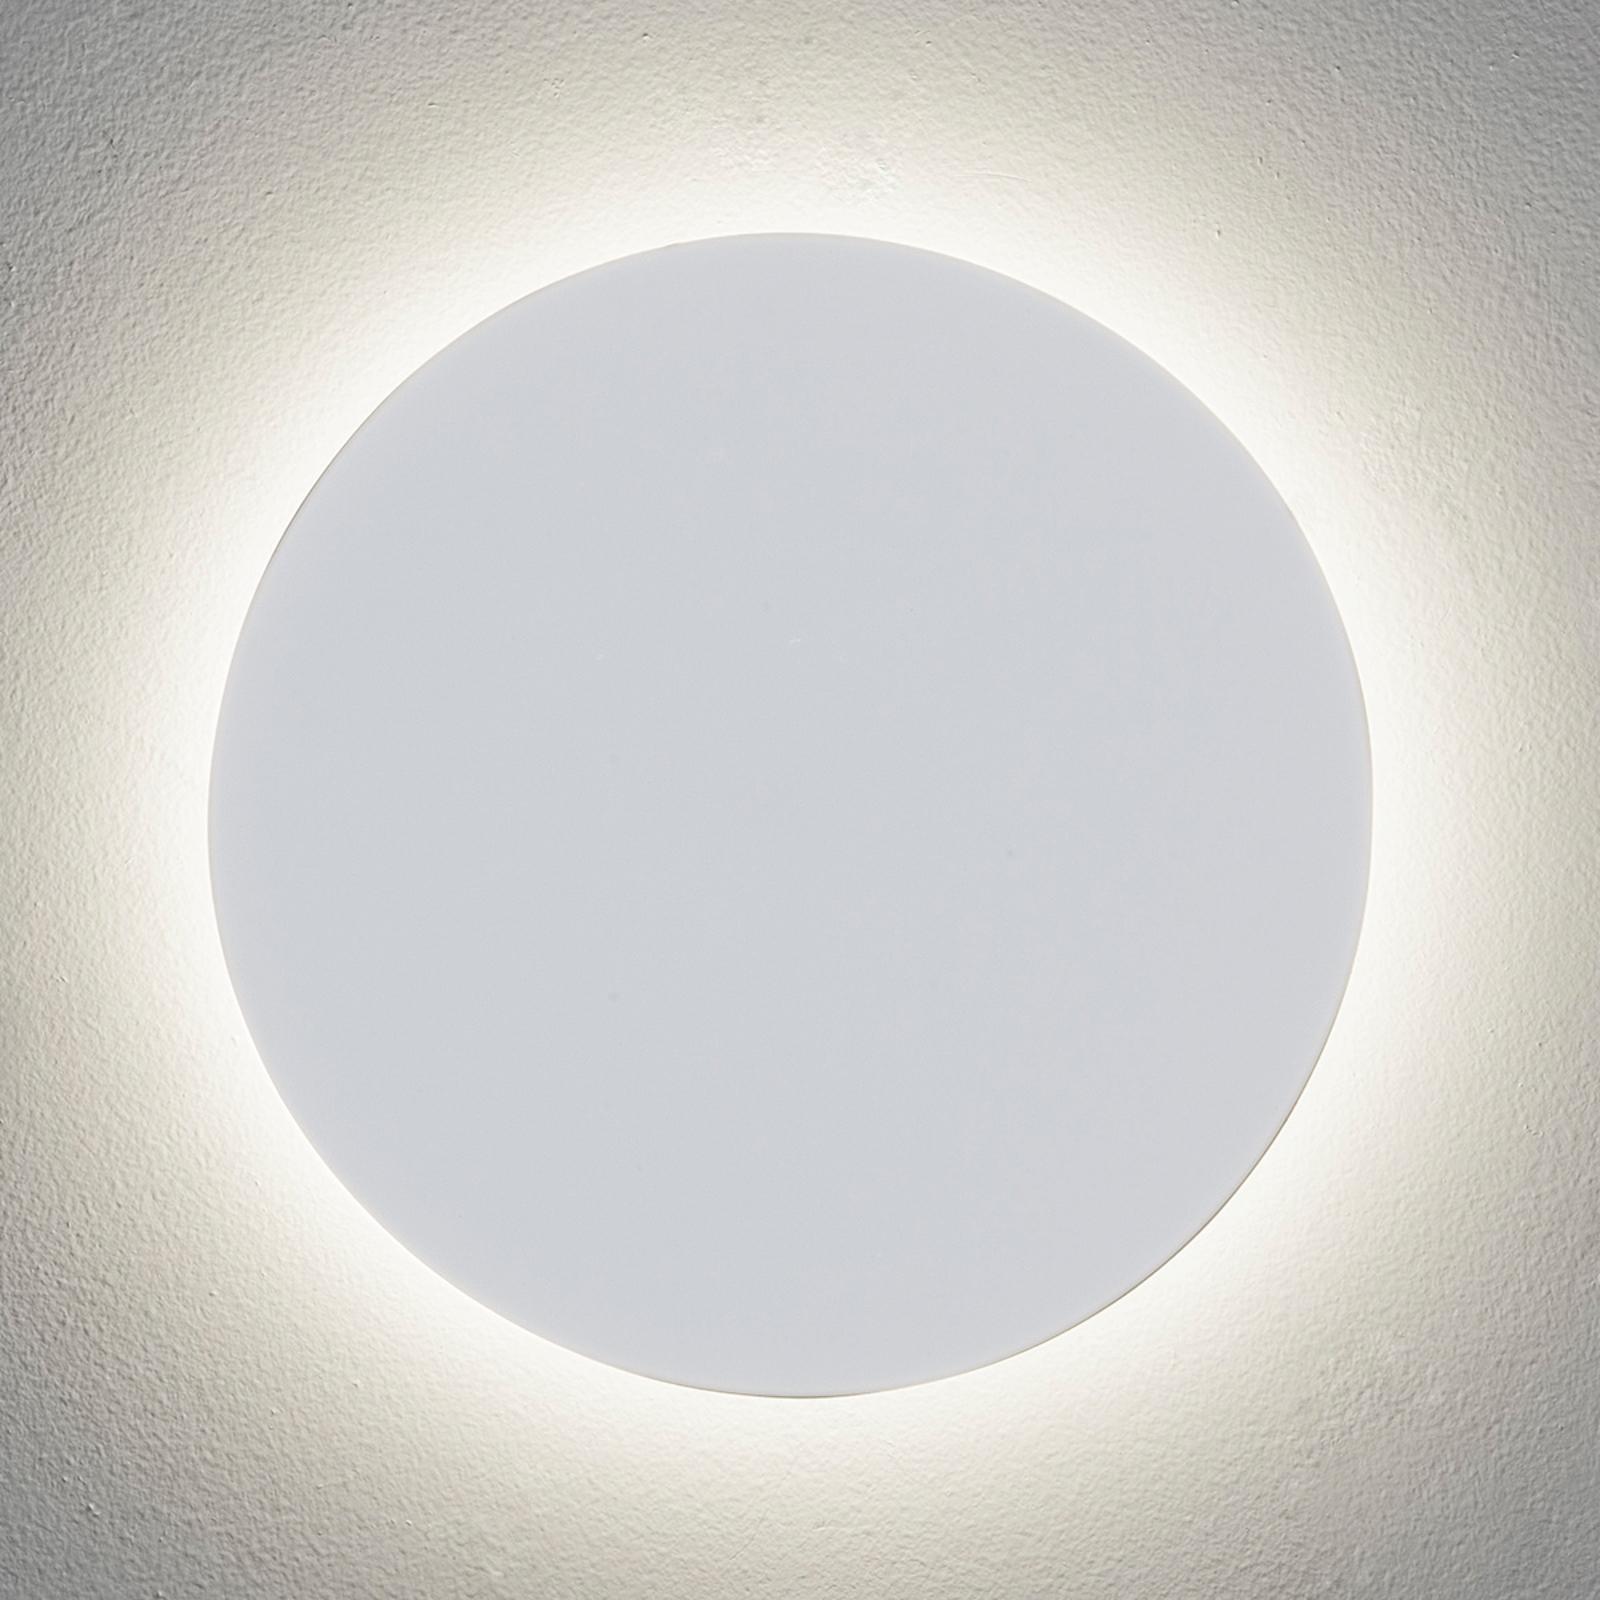 Eclipse Round LED-vegglampe med flott effekt